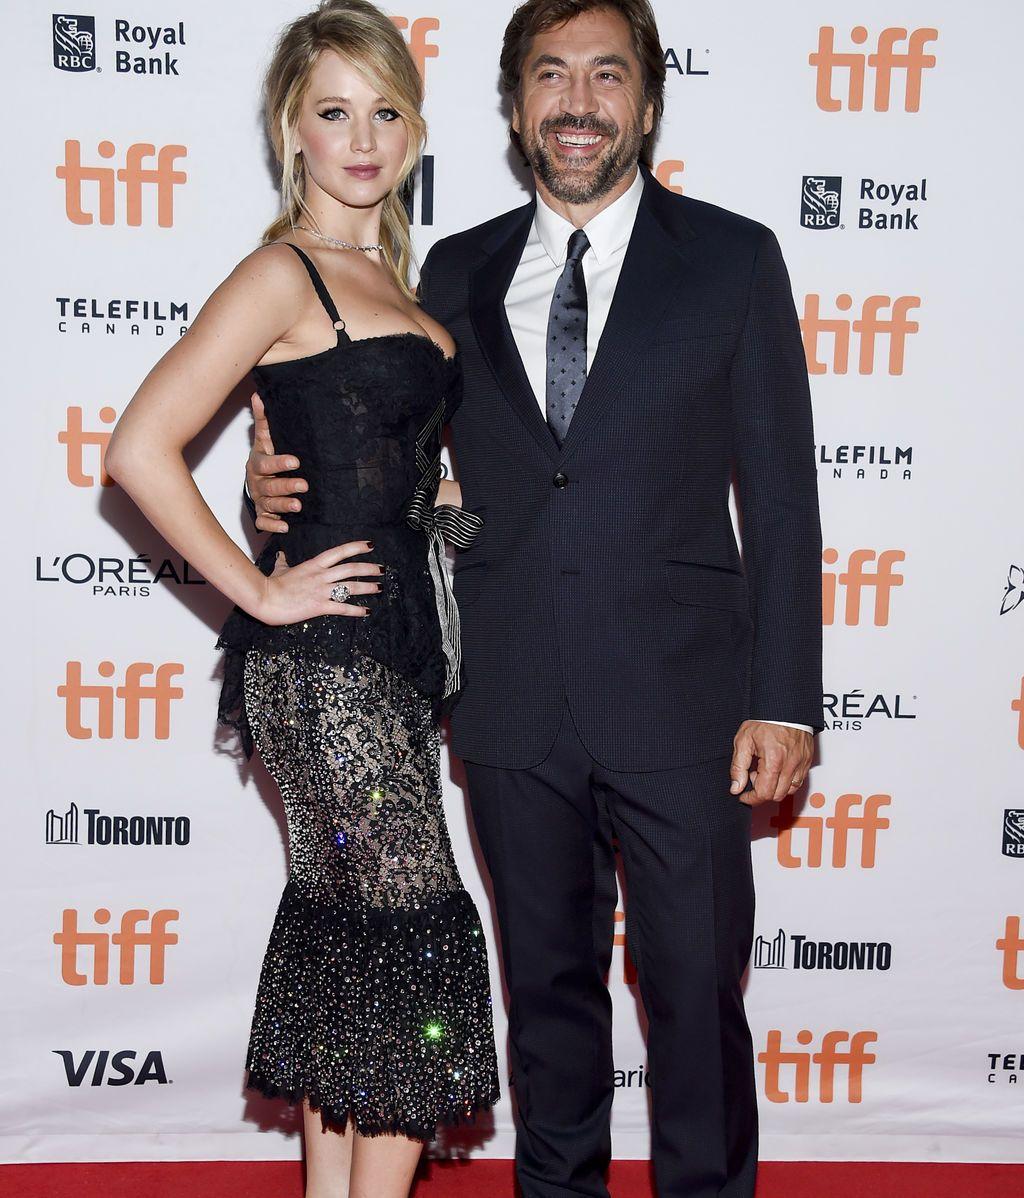 Jennifer Lawrence y Javier Bardem